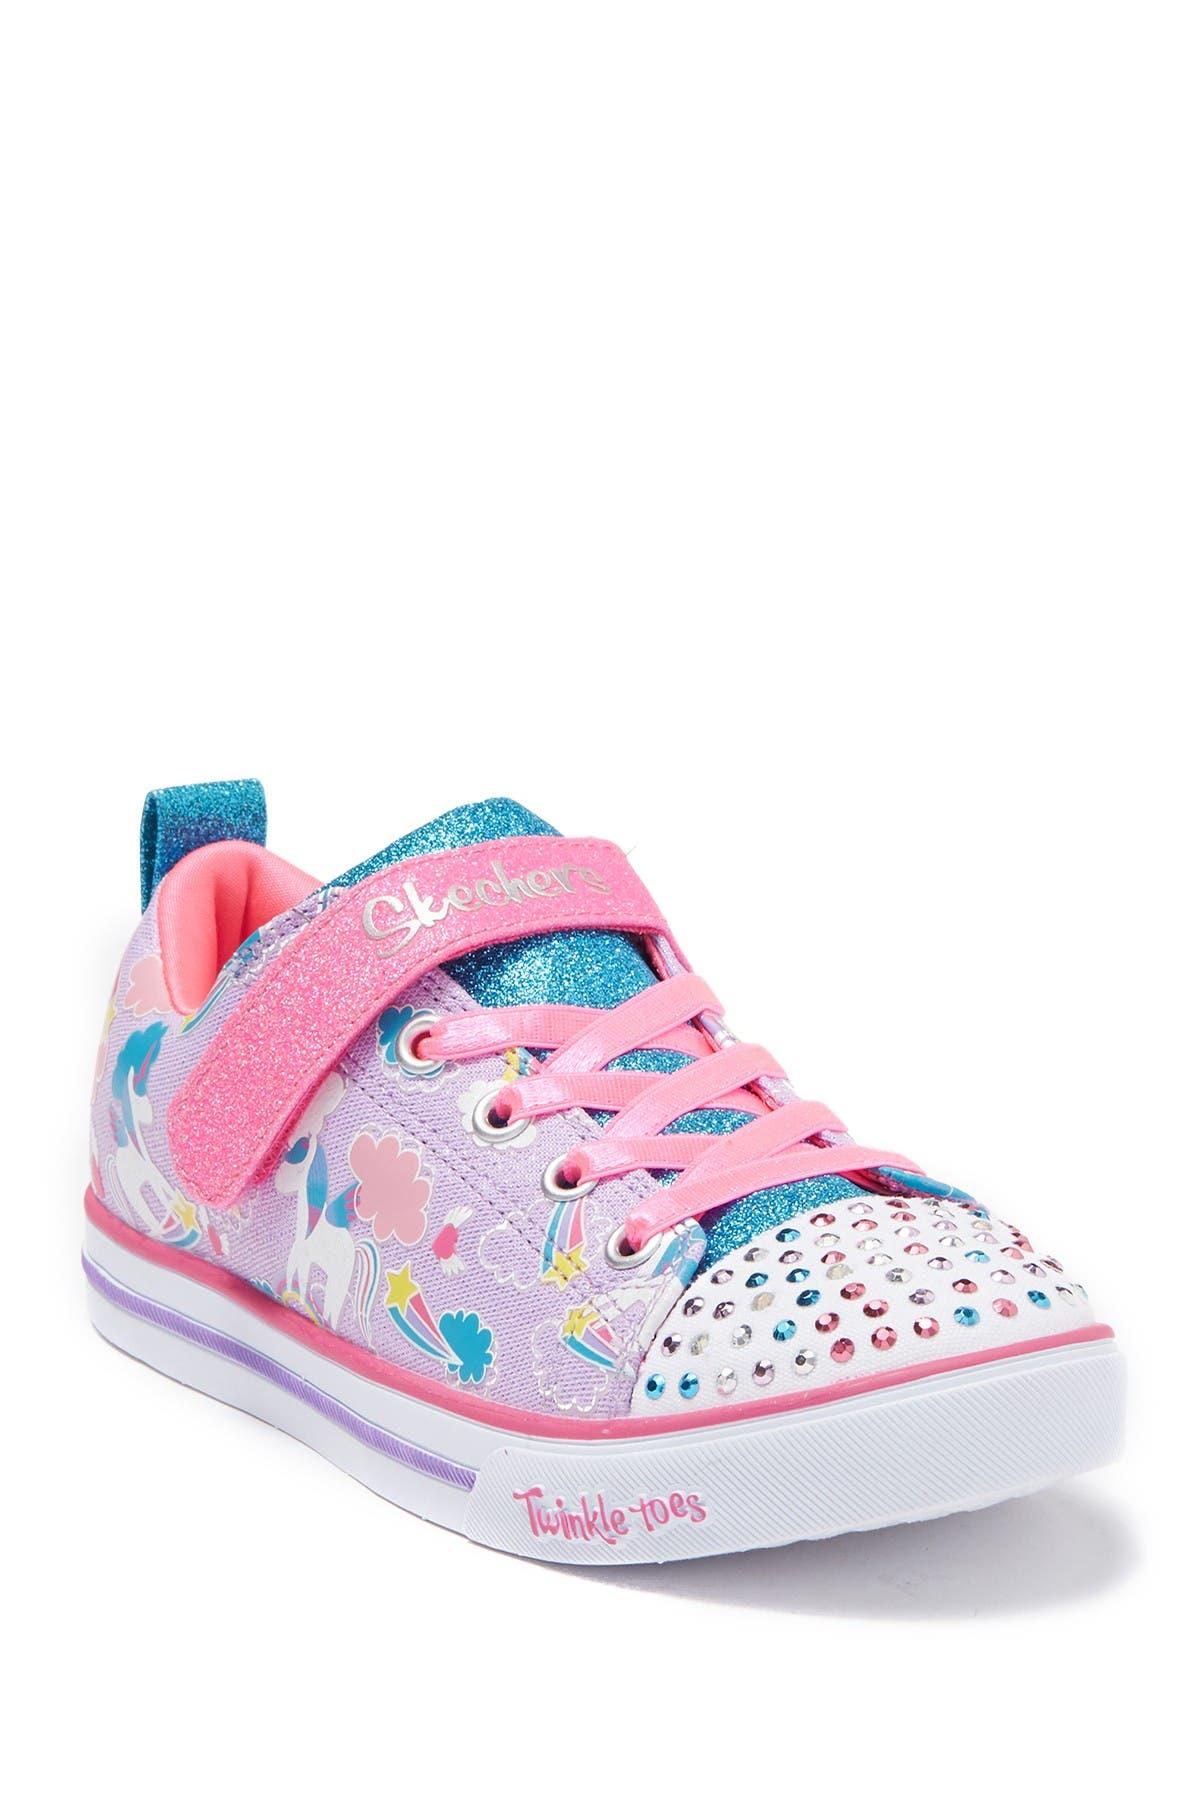 Image of Skechers Sparkle Lite Sparkle Friends Sneaker